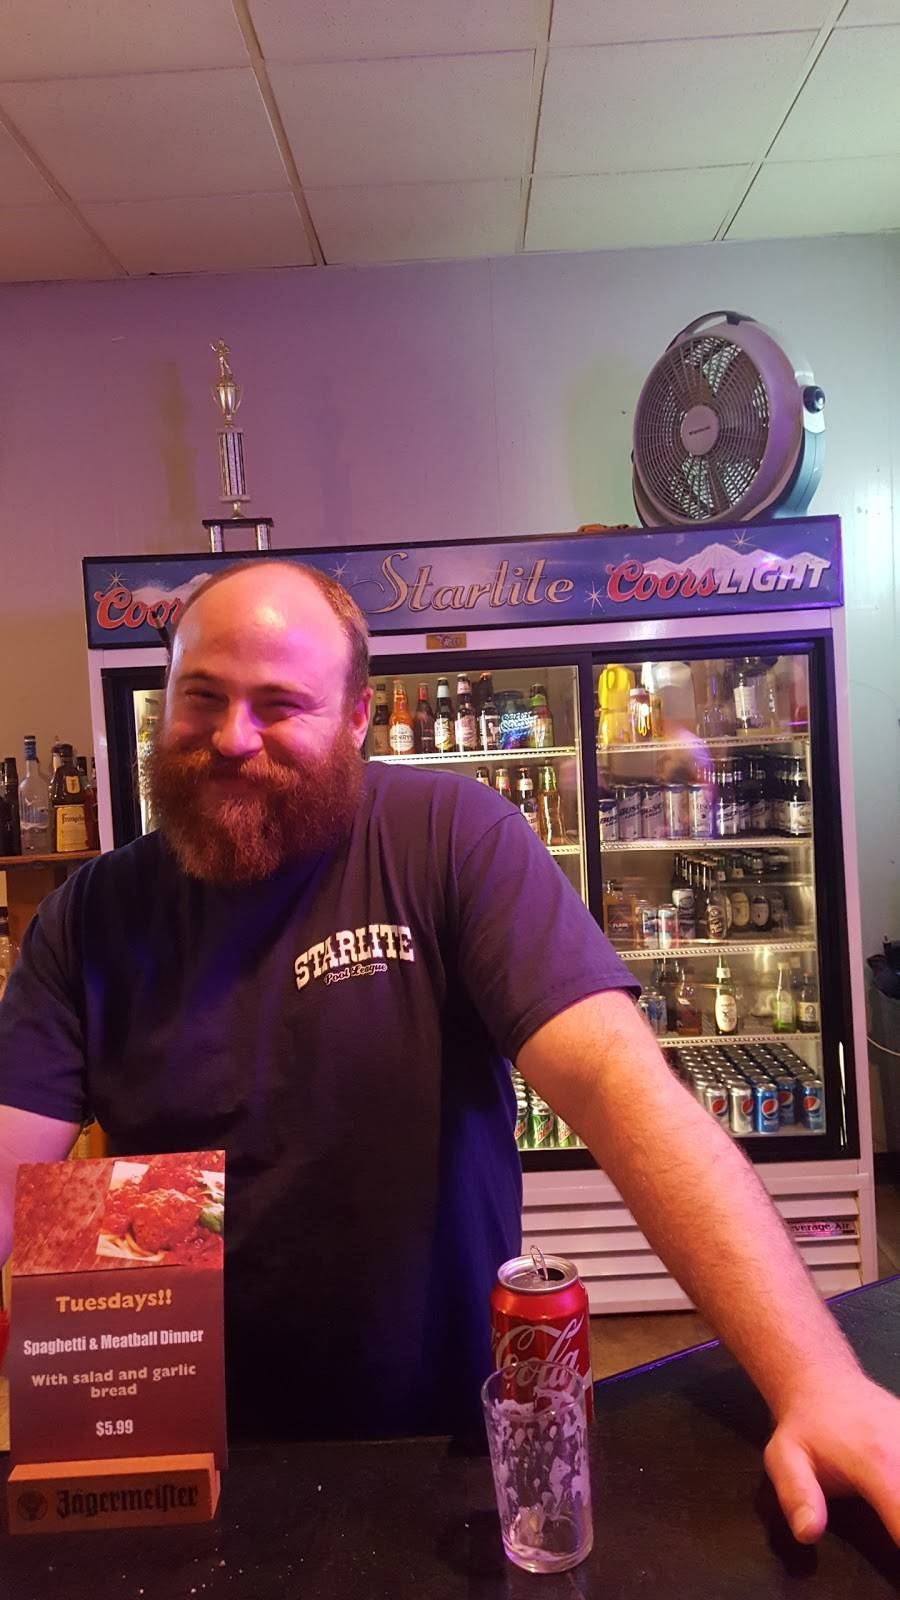 Starlite Lounge & Restaurant | restaurant | 930 Market St, Mahaffey, PA 15757, USA | 8142776729 OR +1 814-277-6729